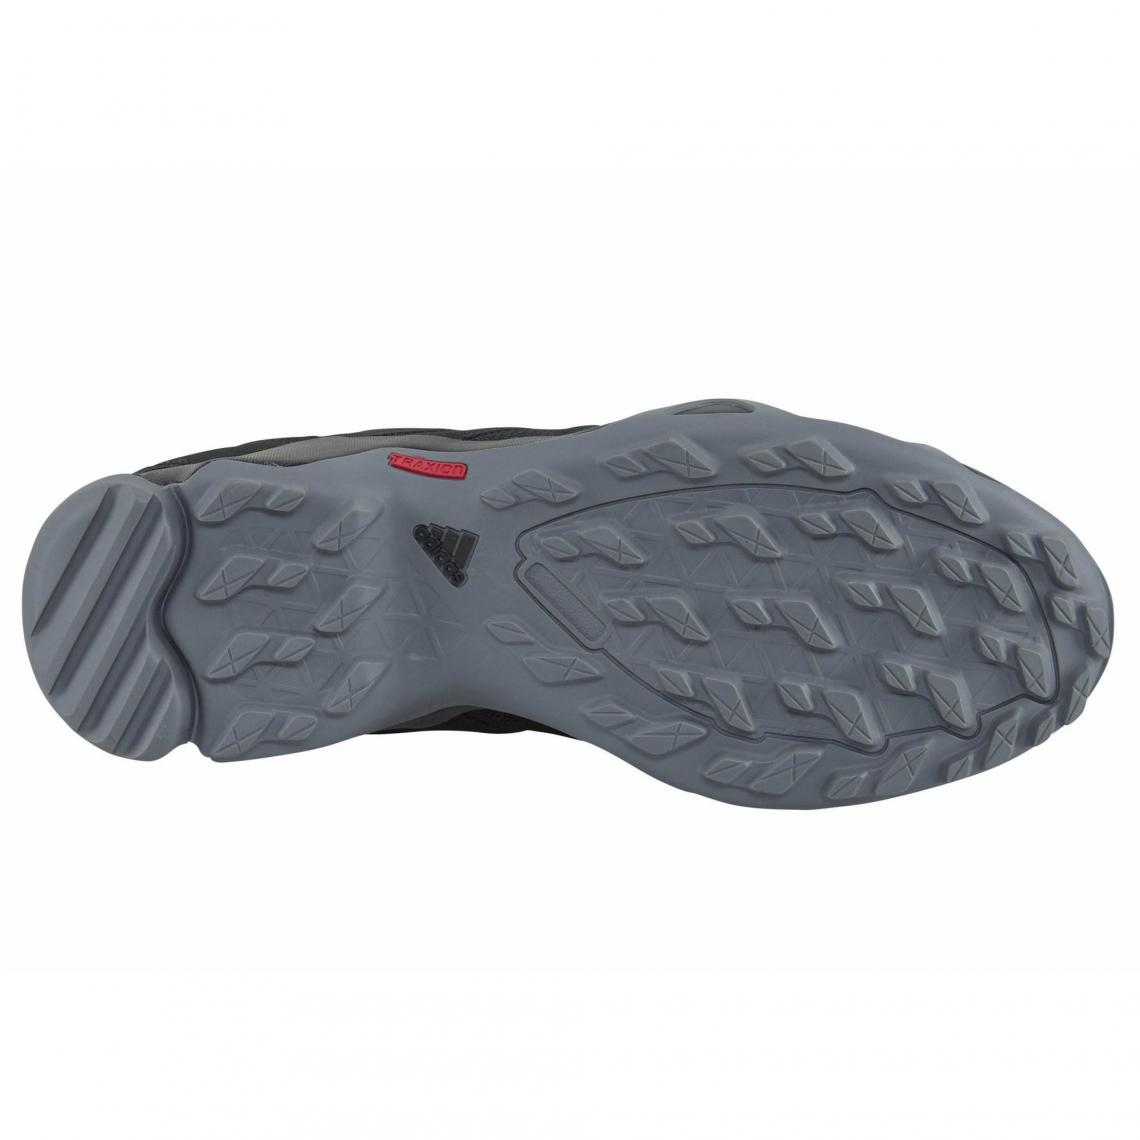 new styles 5a315 672ae adidas Performance Terrex AX2R chaussures de randonnée homme - Noir Adidas  Performance